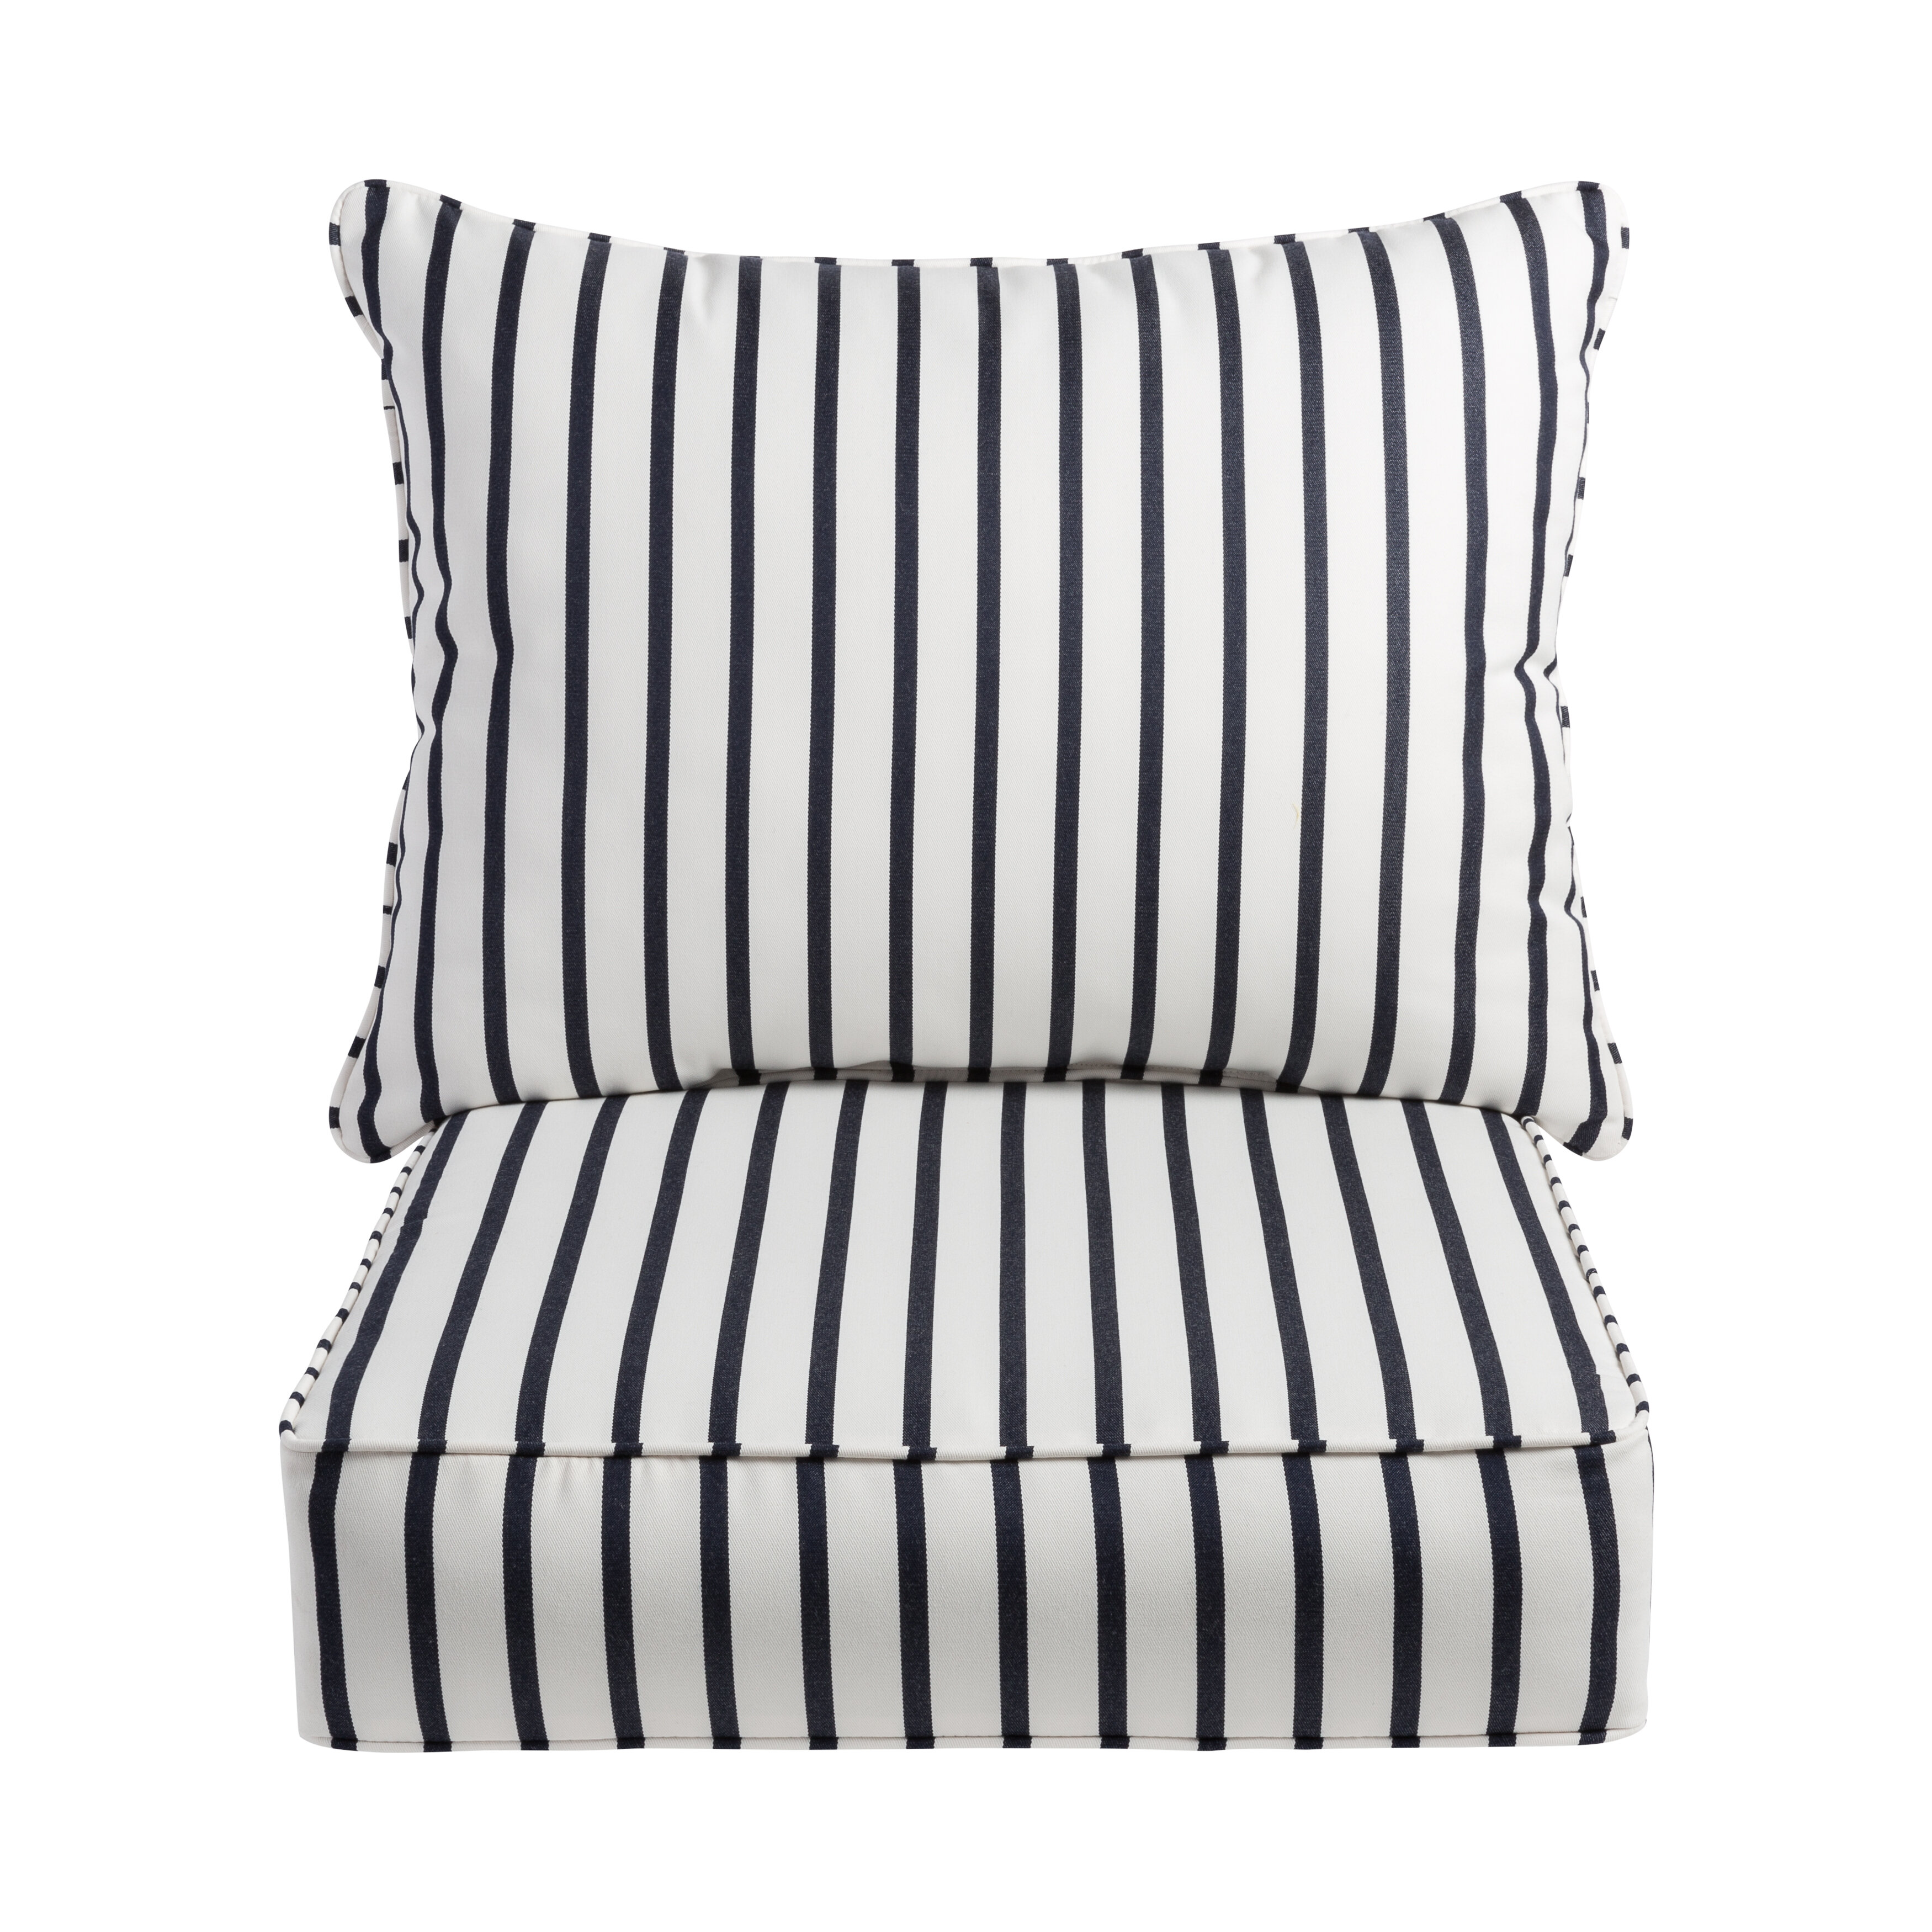 Awe Inspiring Whitten Stripe Indoor Outdoor Sunbrella Lounge Chair Cushion Cjindustries Chair Design For Home Cjindustriesco